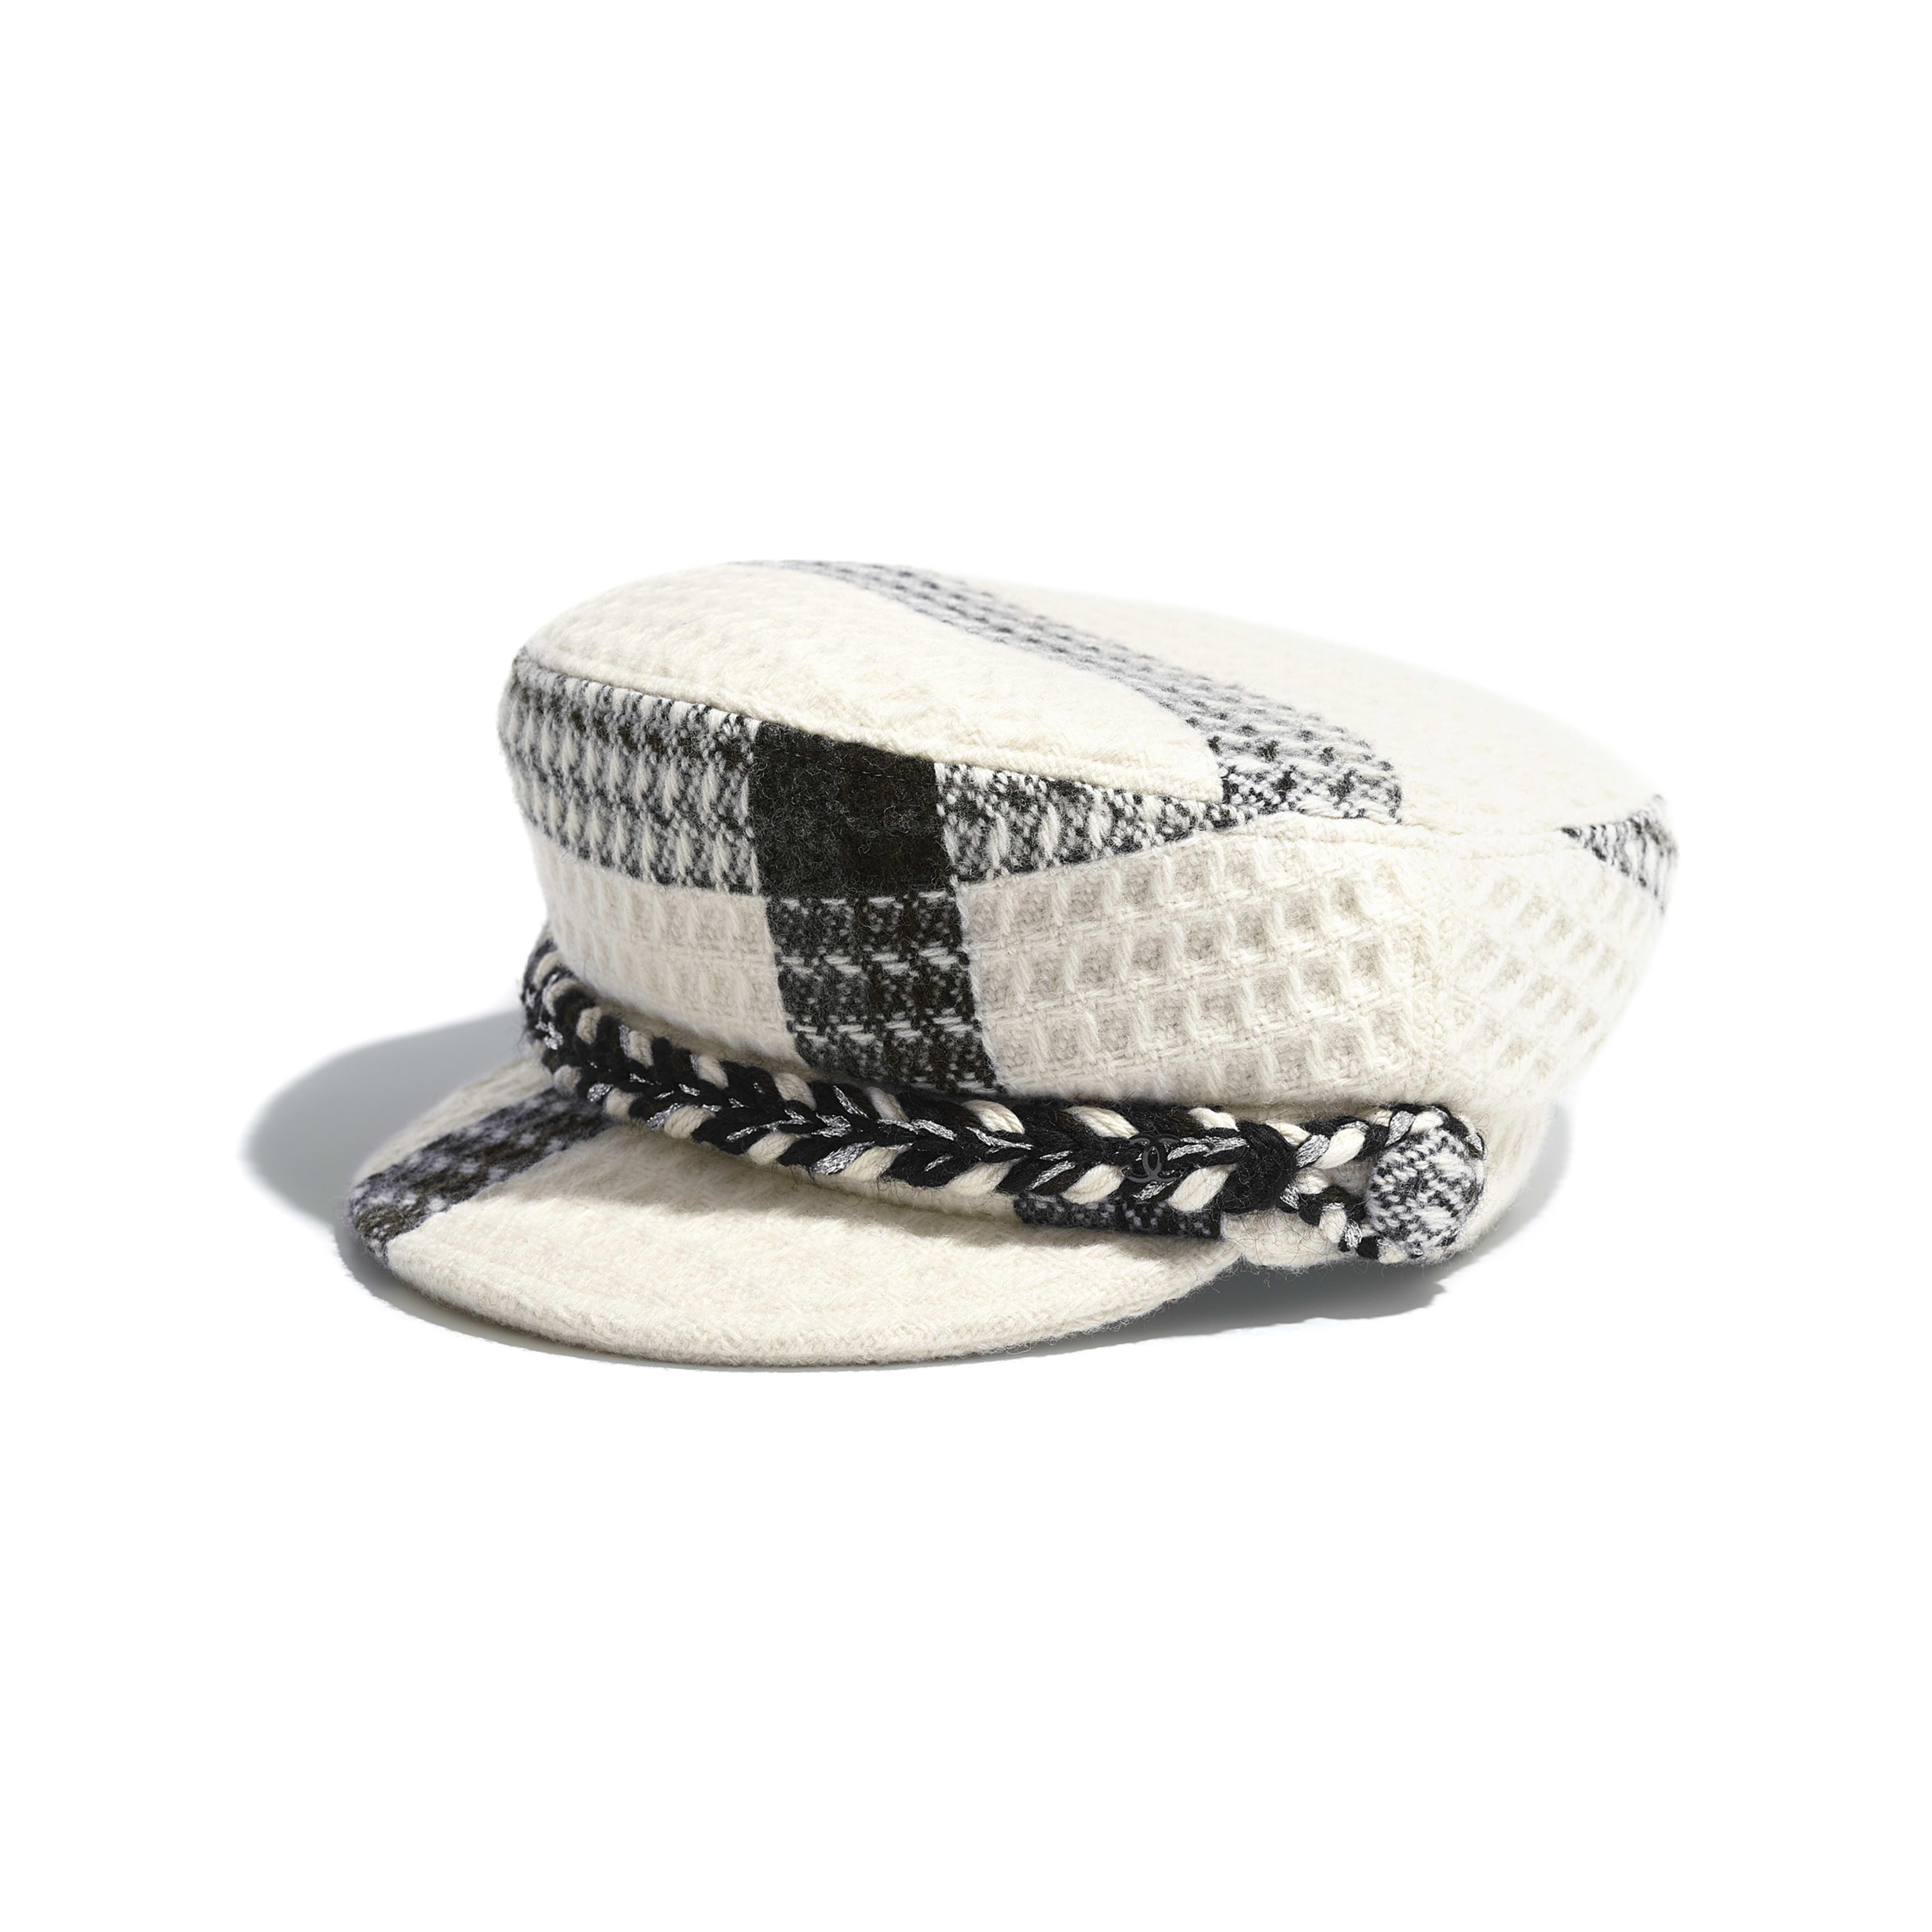 46859da4912000 ... reduced sailor cap wool tweed ecru gray navy blue a4b29 cb50d